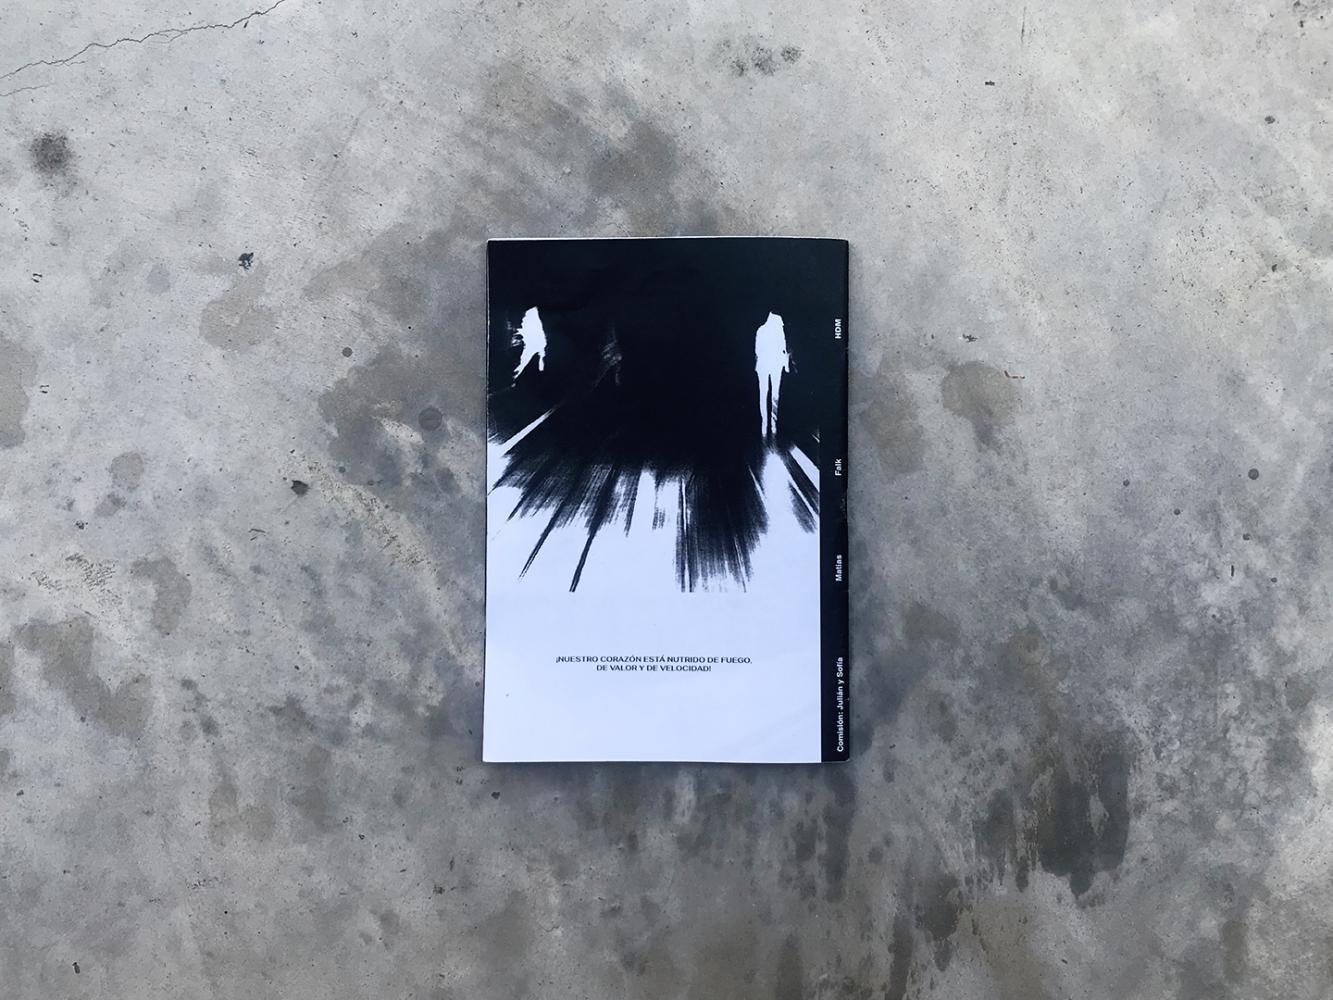 Matias Falk - Manifiesto Futurista 08